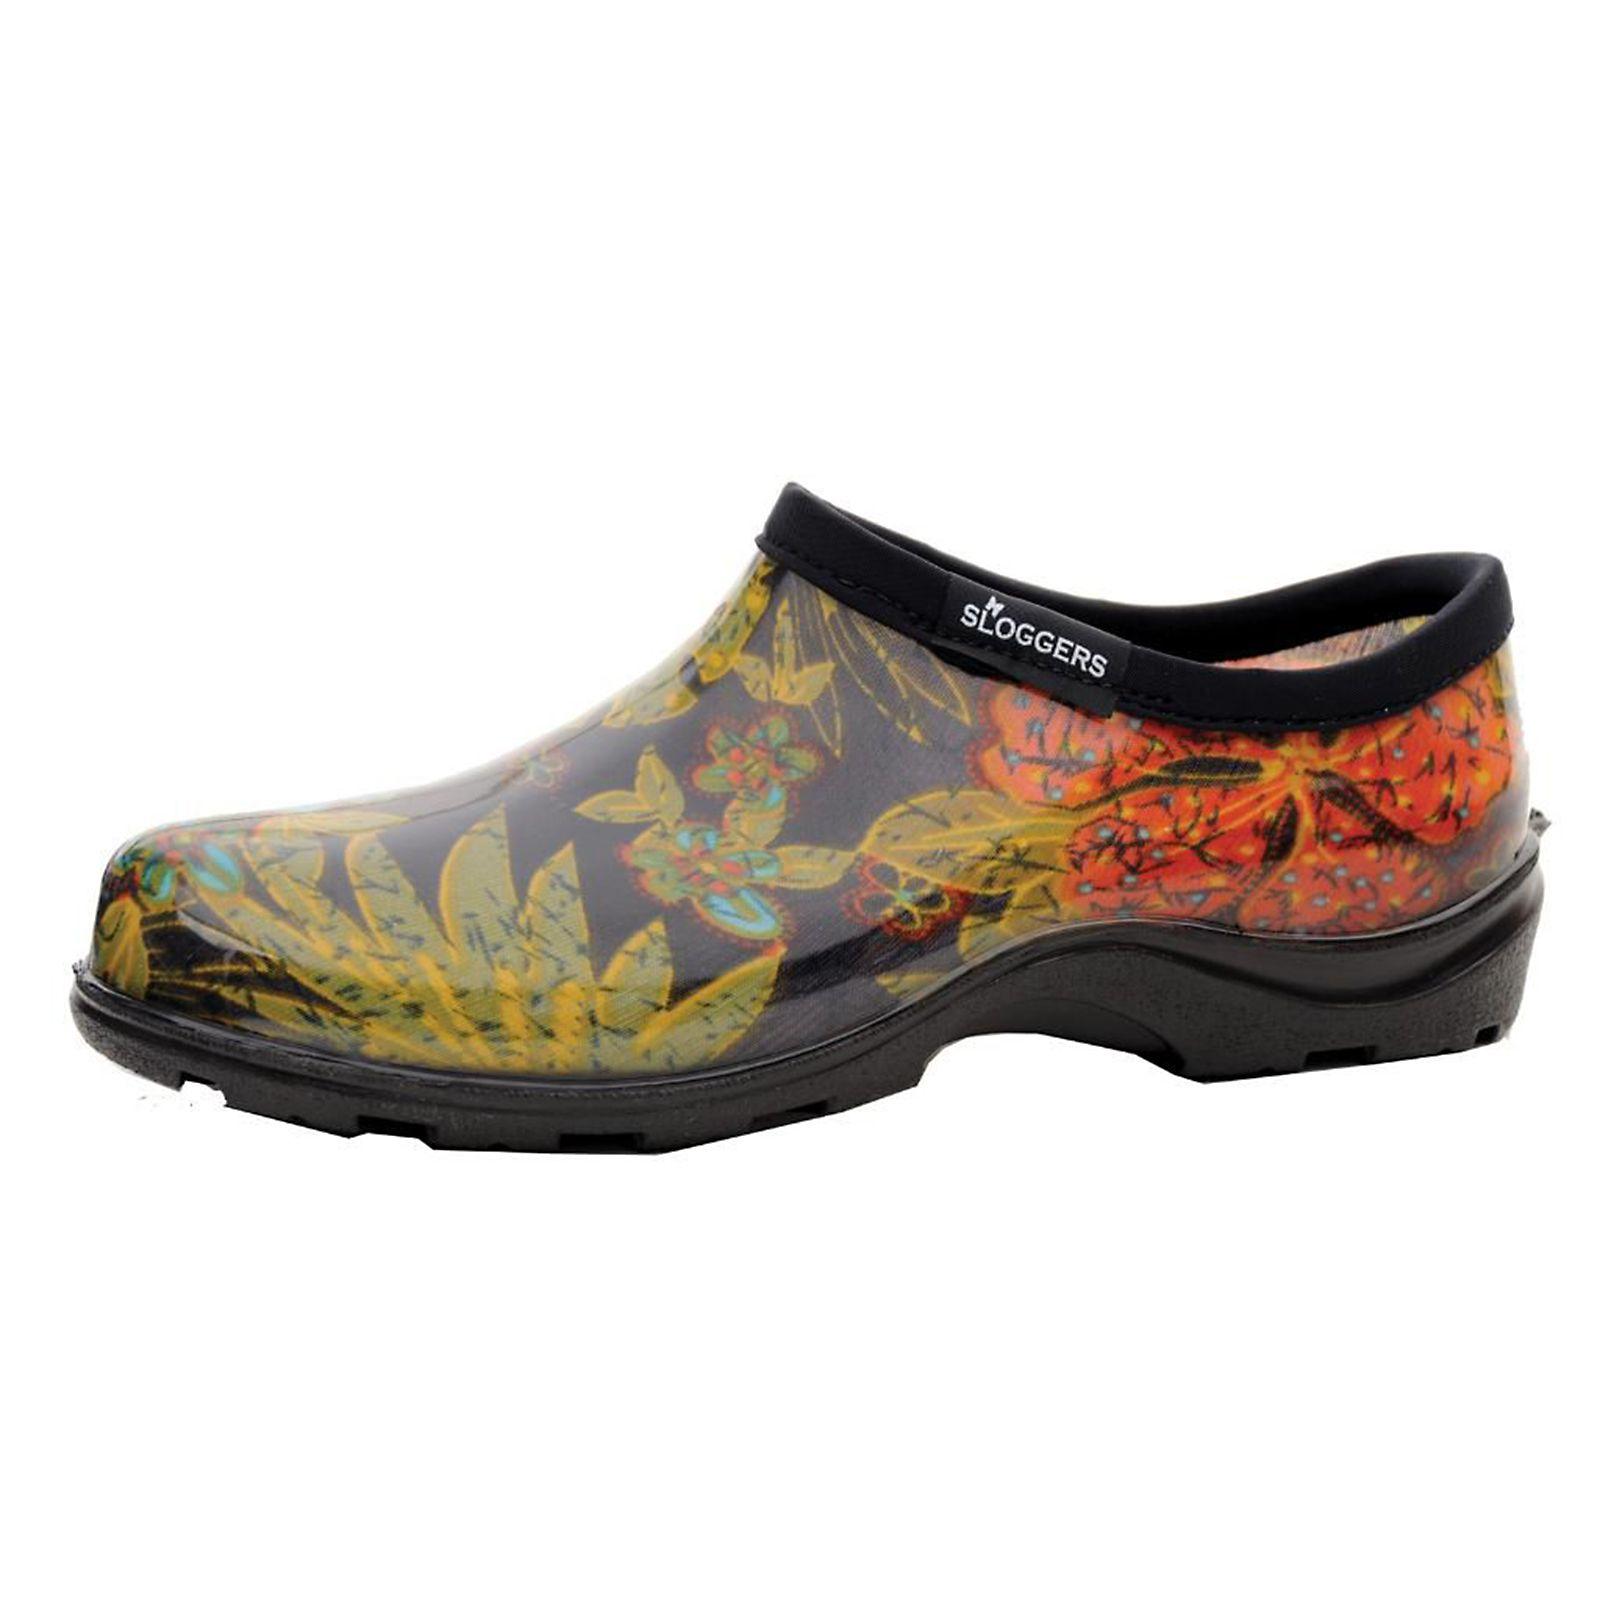 Sloggers Womens Garden Shoe Midsummer Black 091053510134 Great